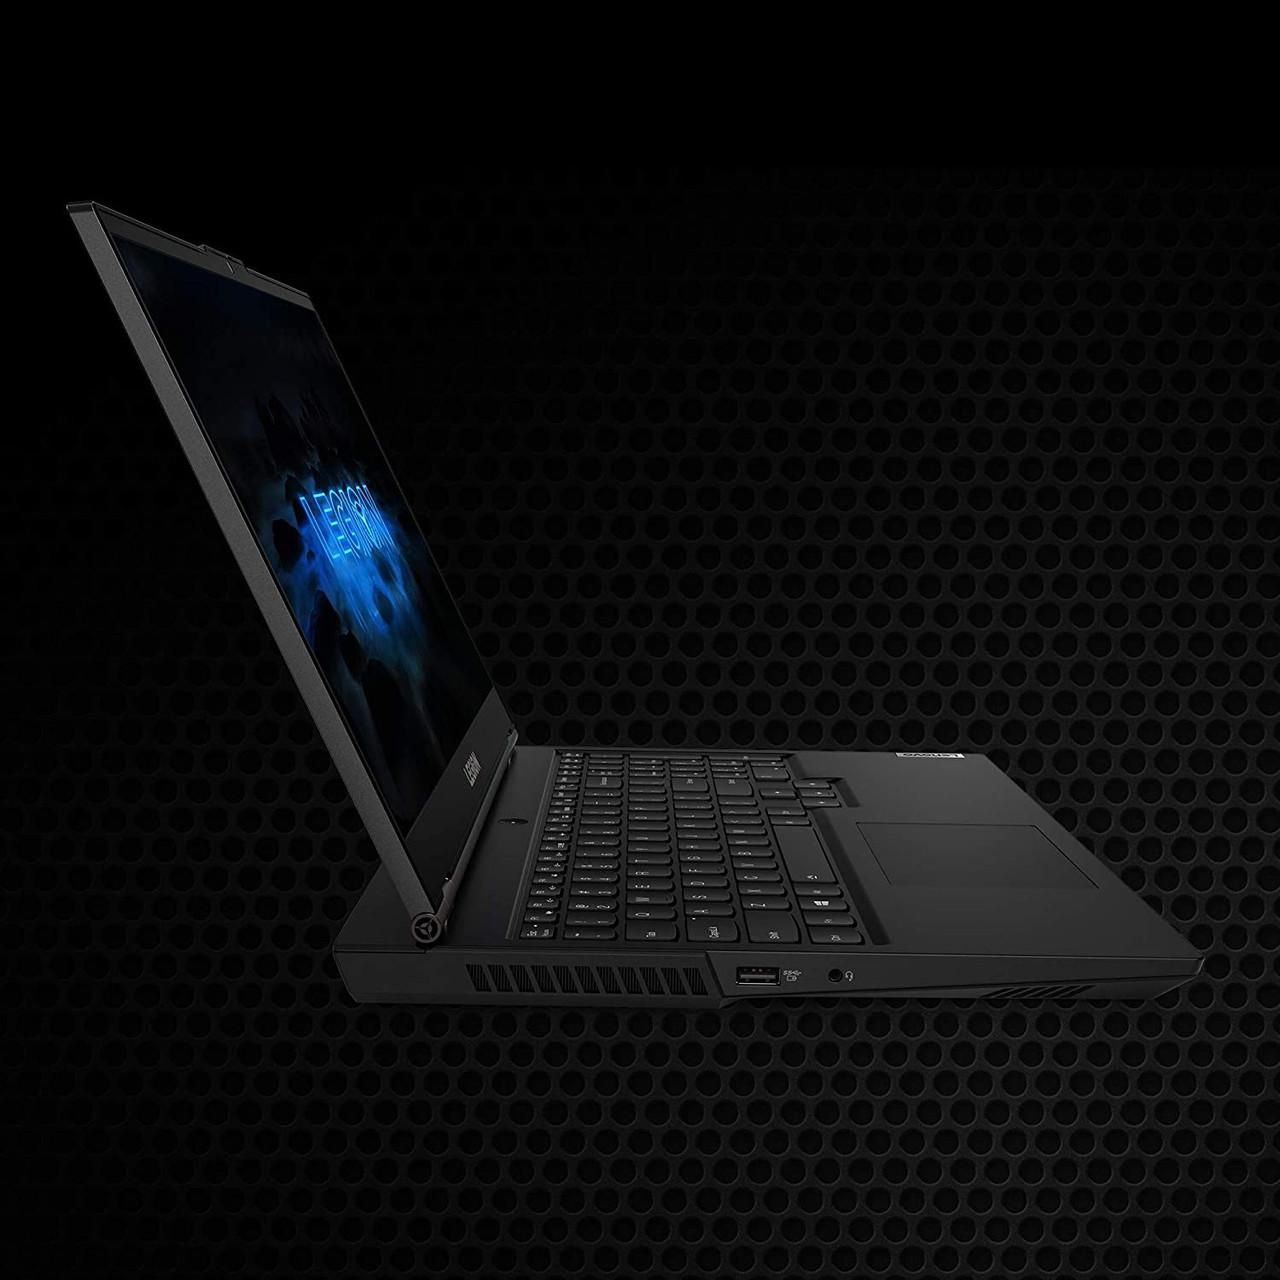 Lenovo Legion 5 Gaming Laptop 15 Fhd 1920x1080 Ips Screen Amd Ryzen 7 4800h Processor 16gb